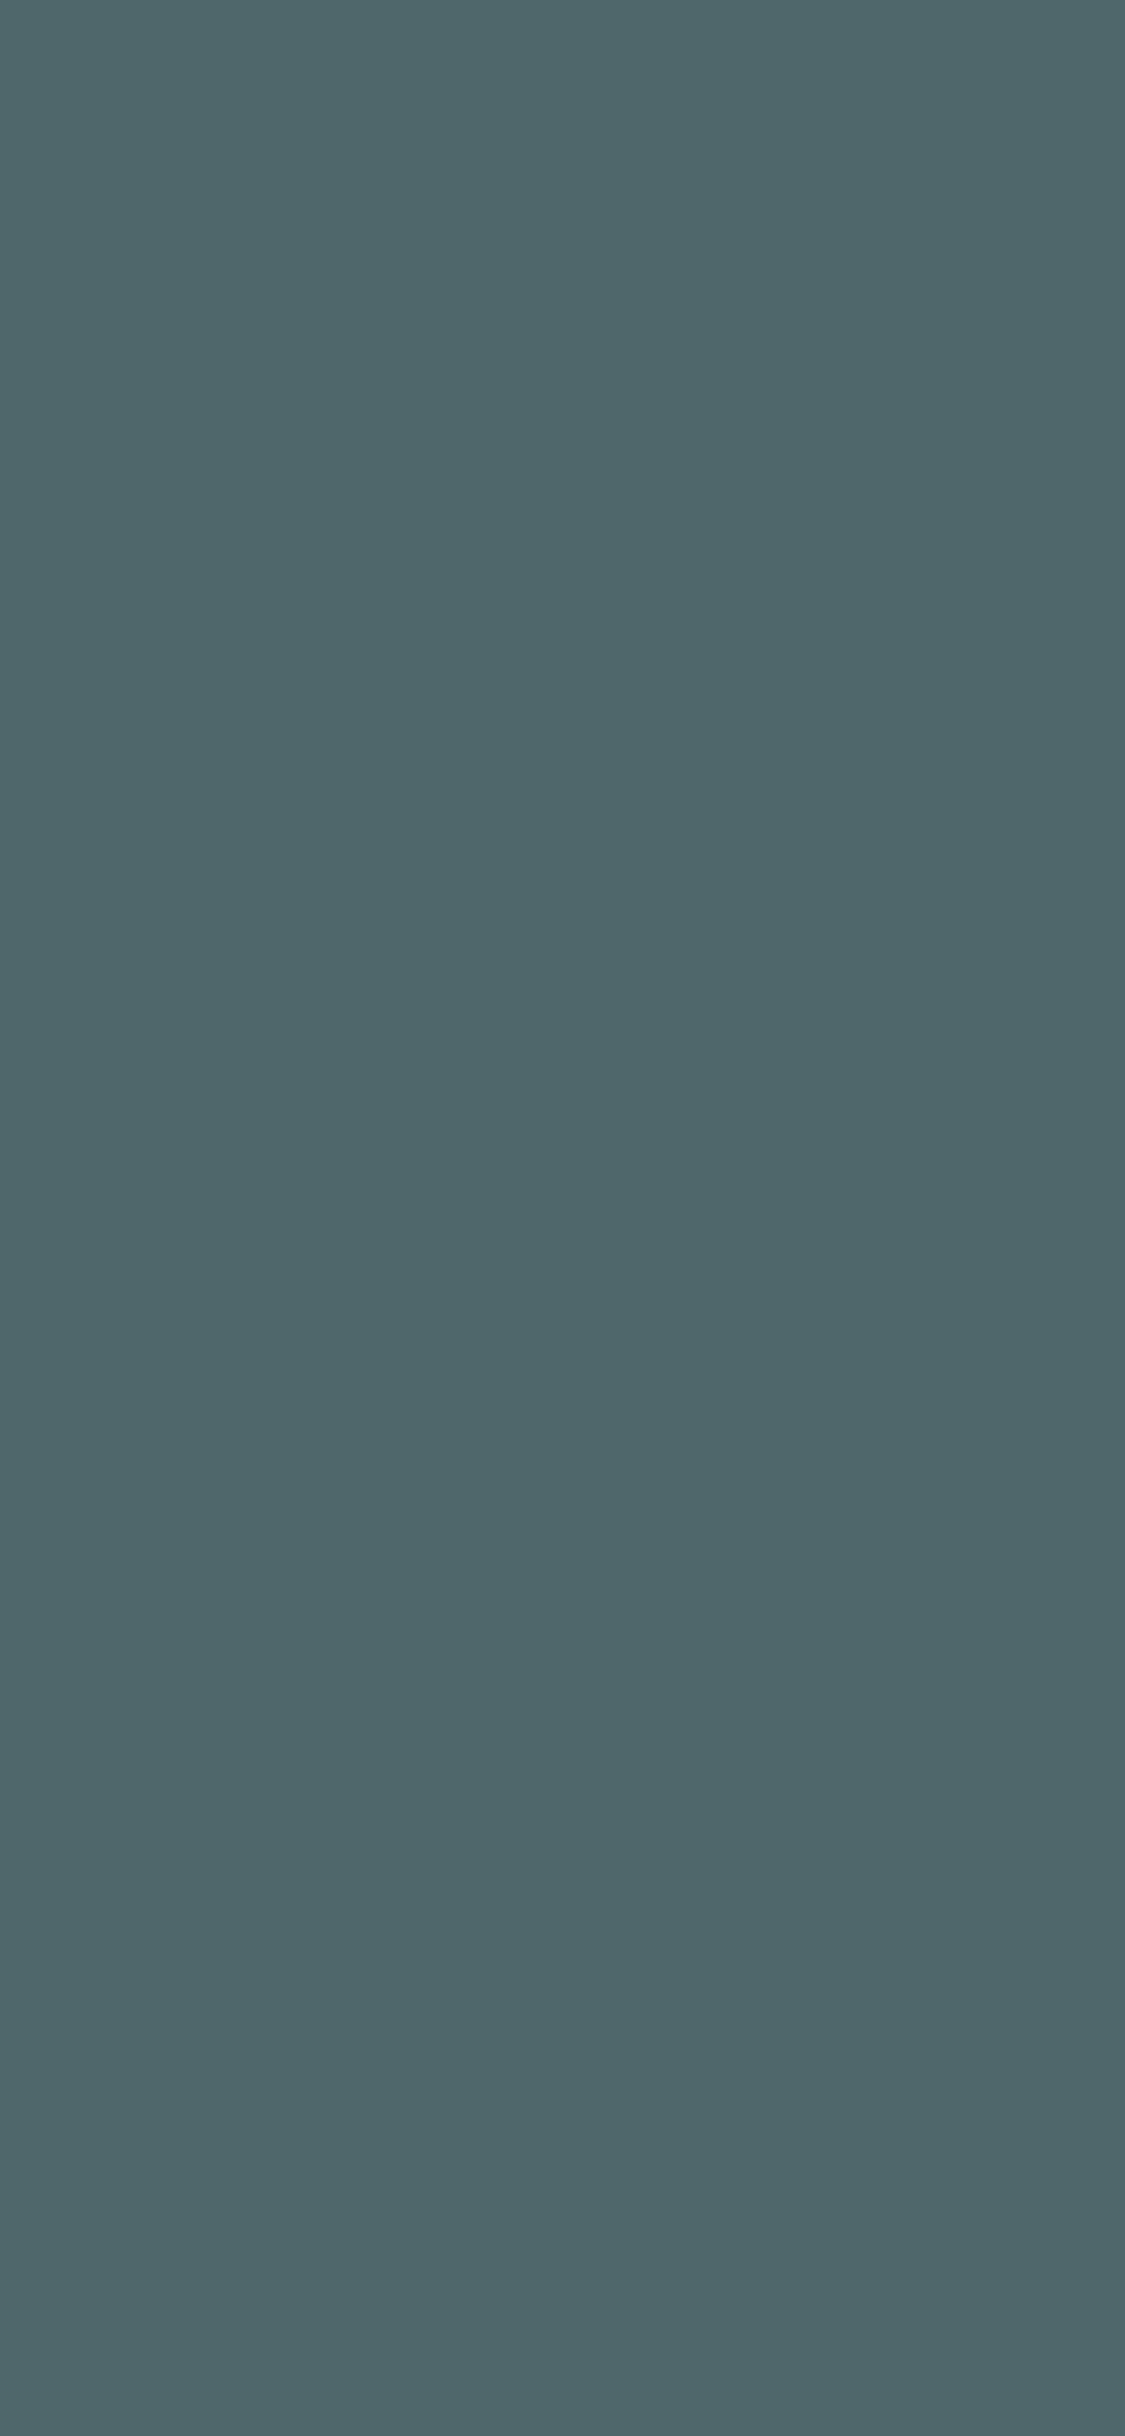 1125x2436 Stormcloud Solid Color Background